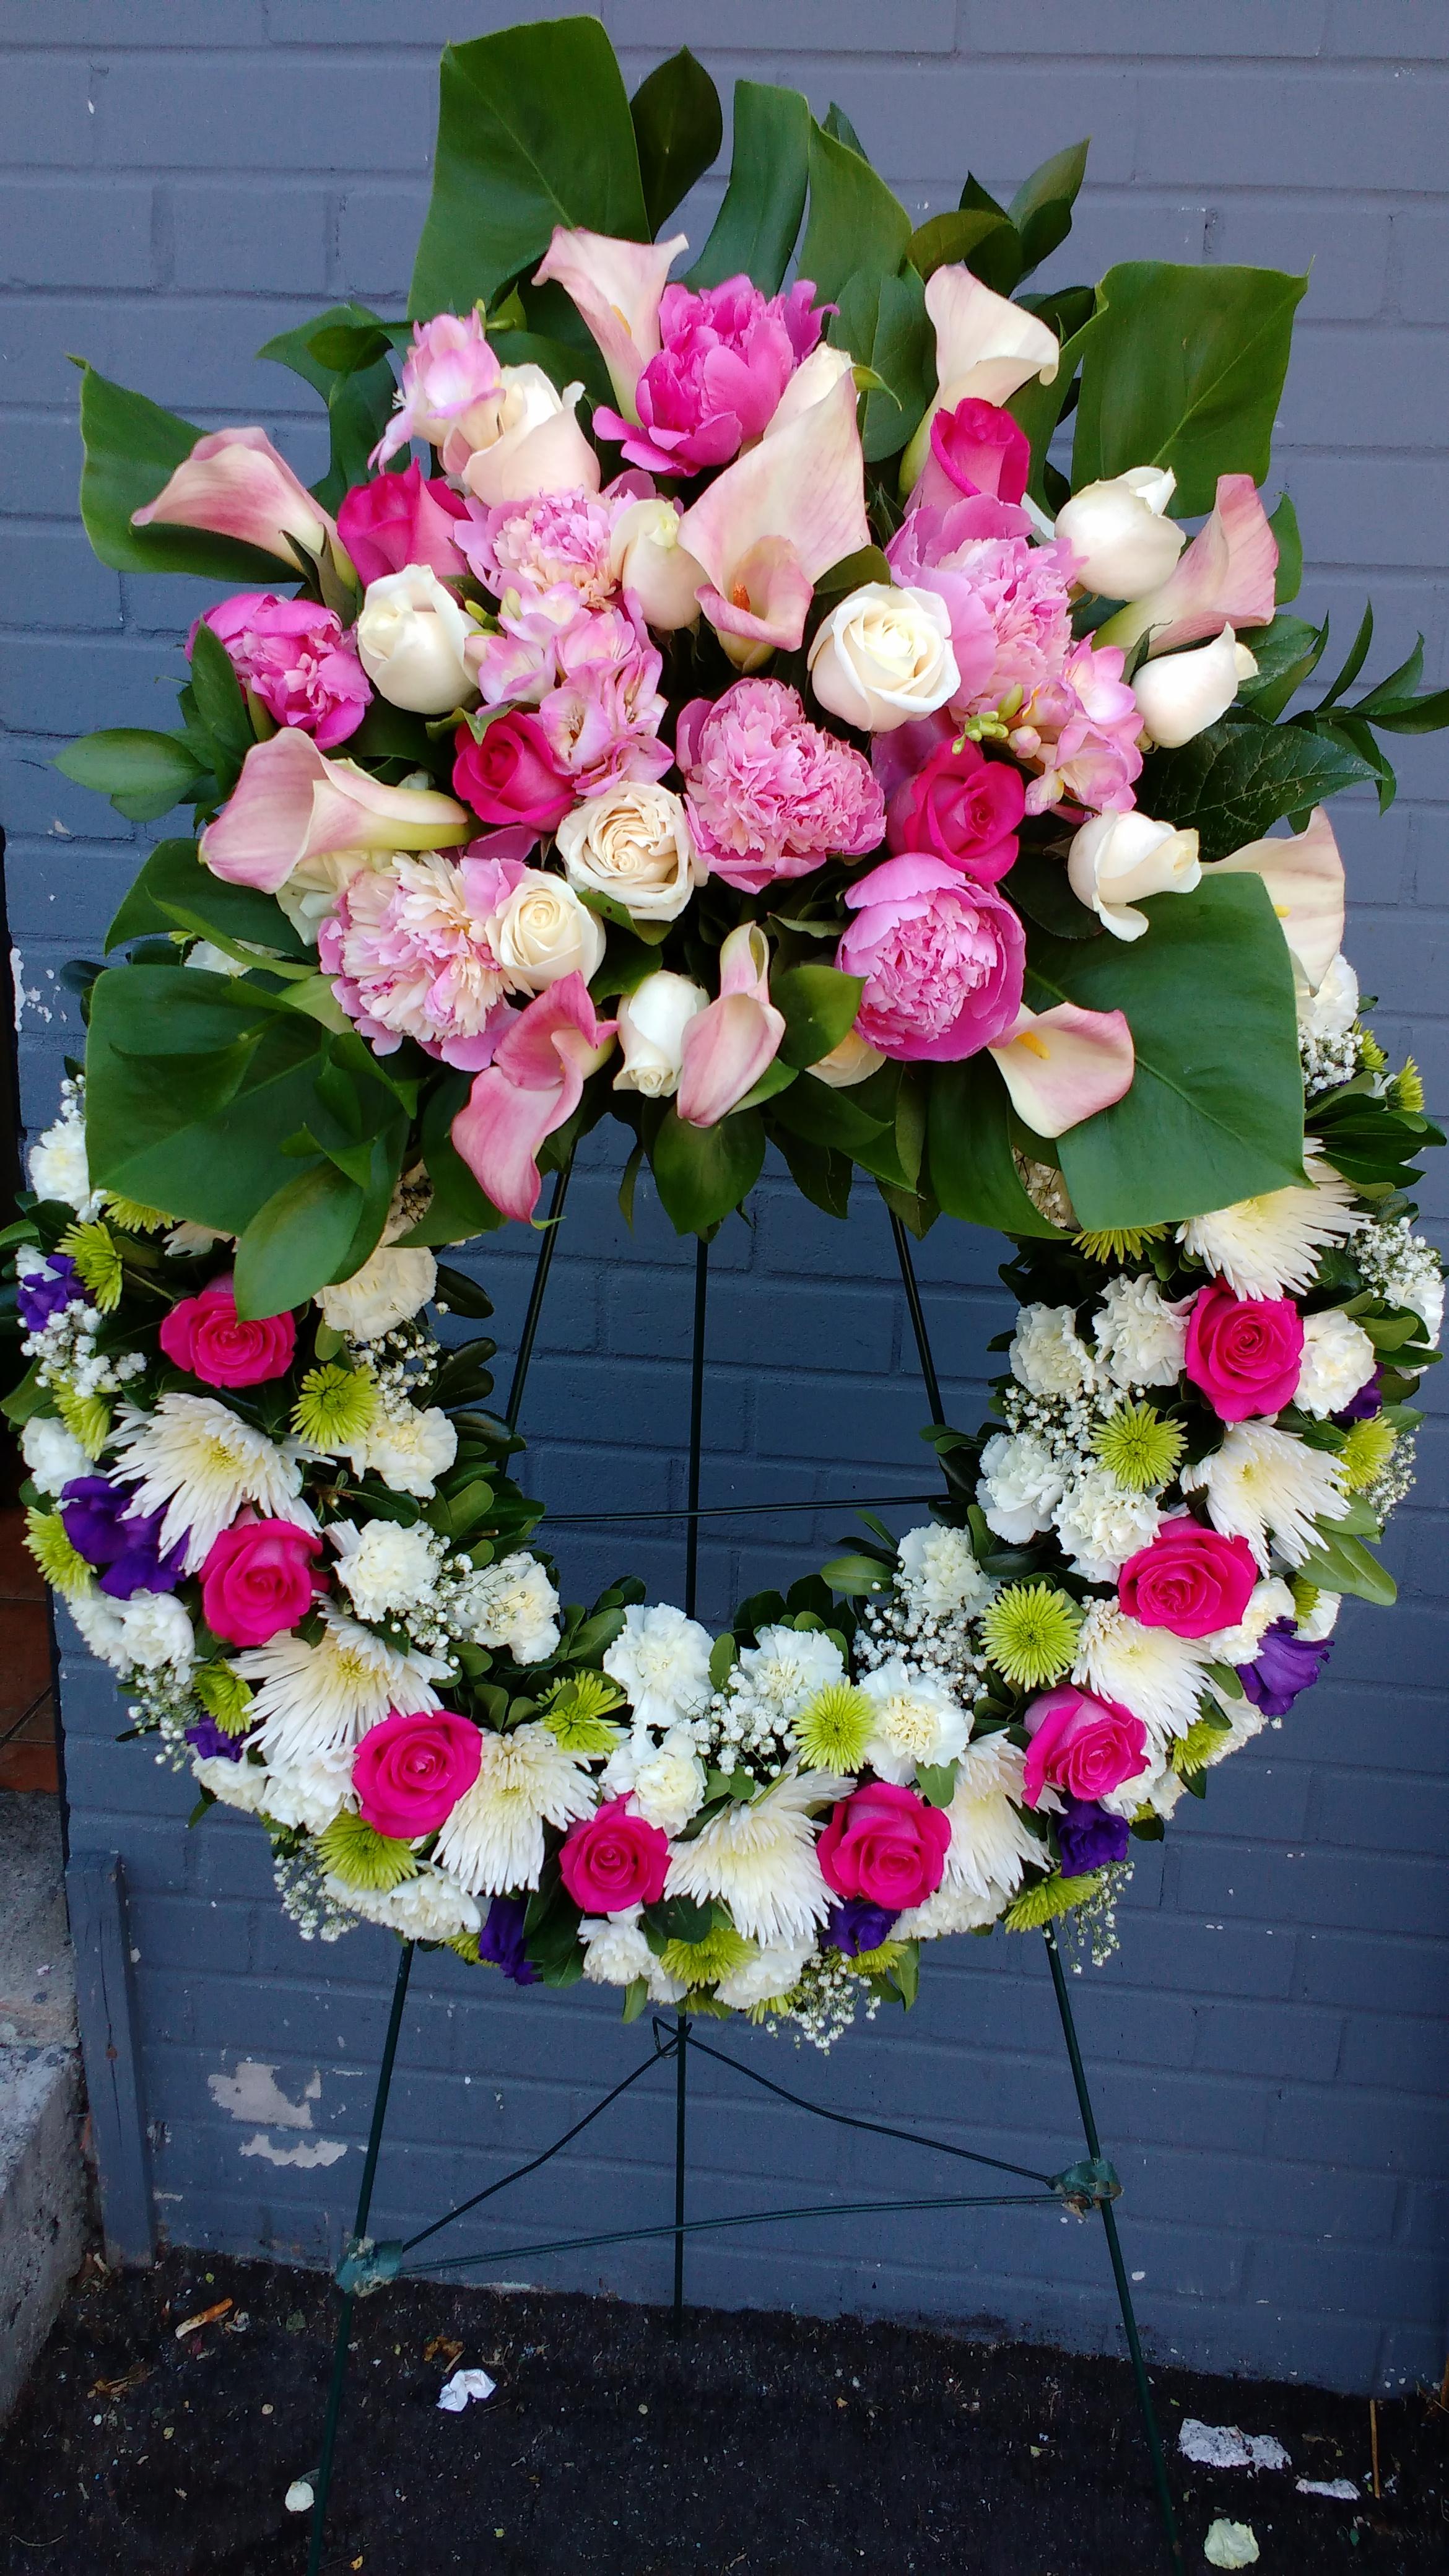 Colourful & Gracious Wreath